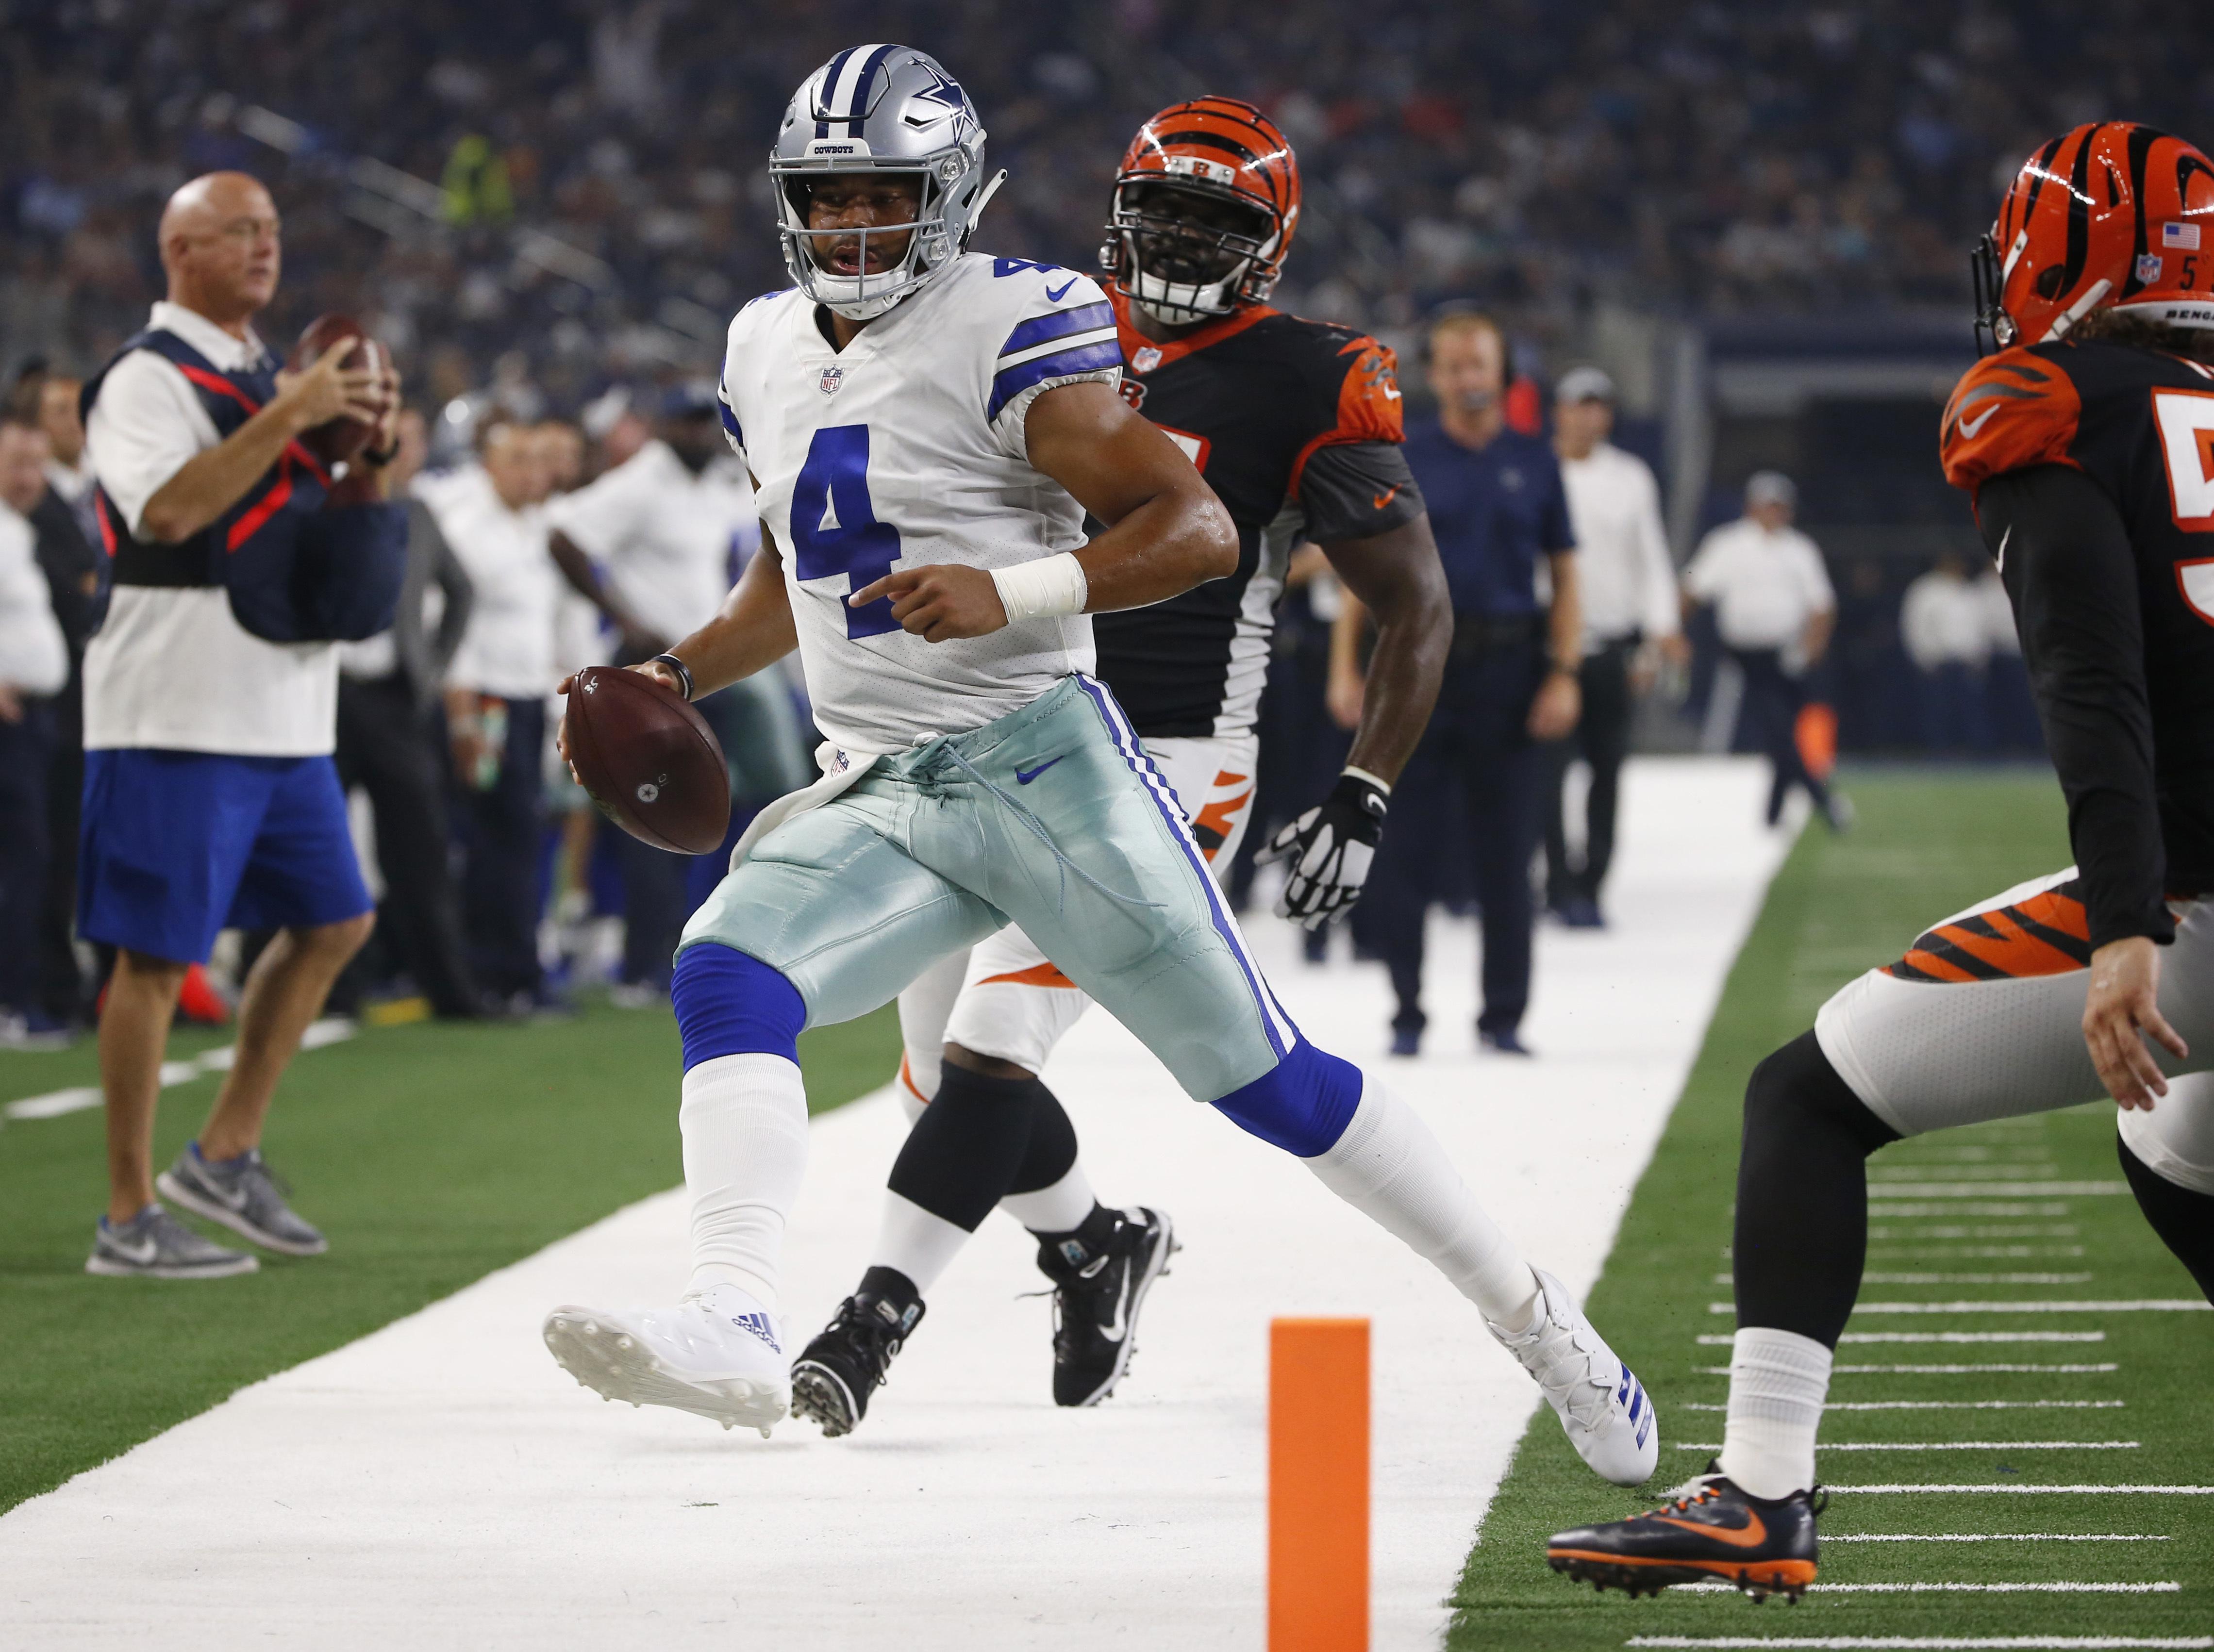 Dallas Cowboys quarterback Dak Prescott is forced out of bounds as he  scrambles against the Cincinnati fa70fdd47